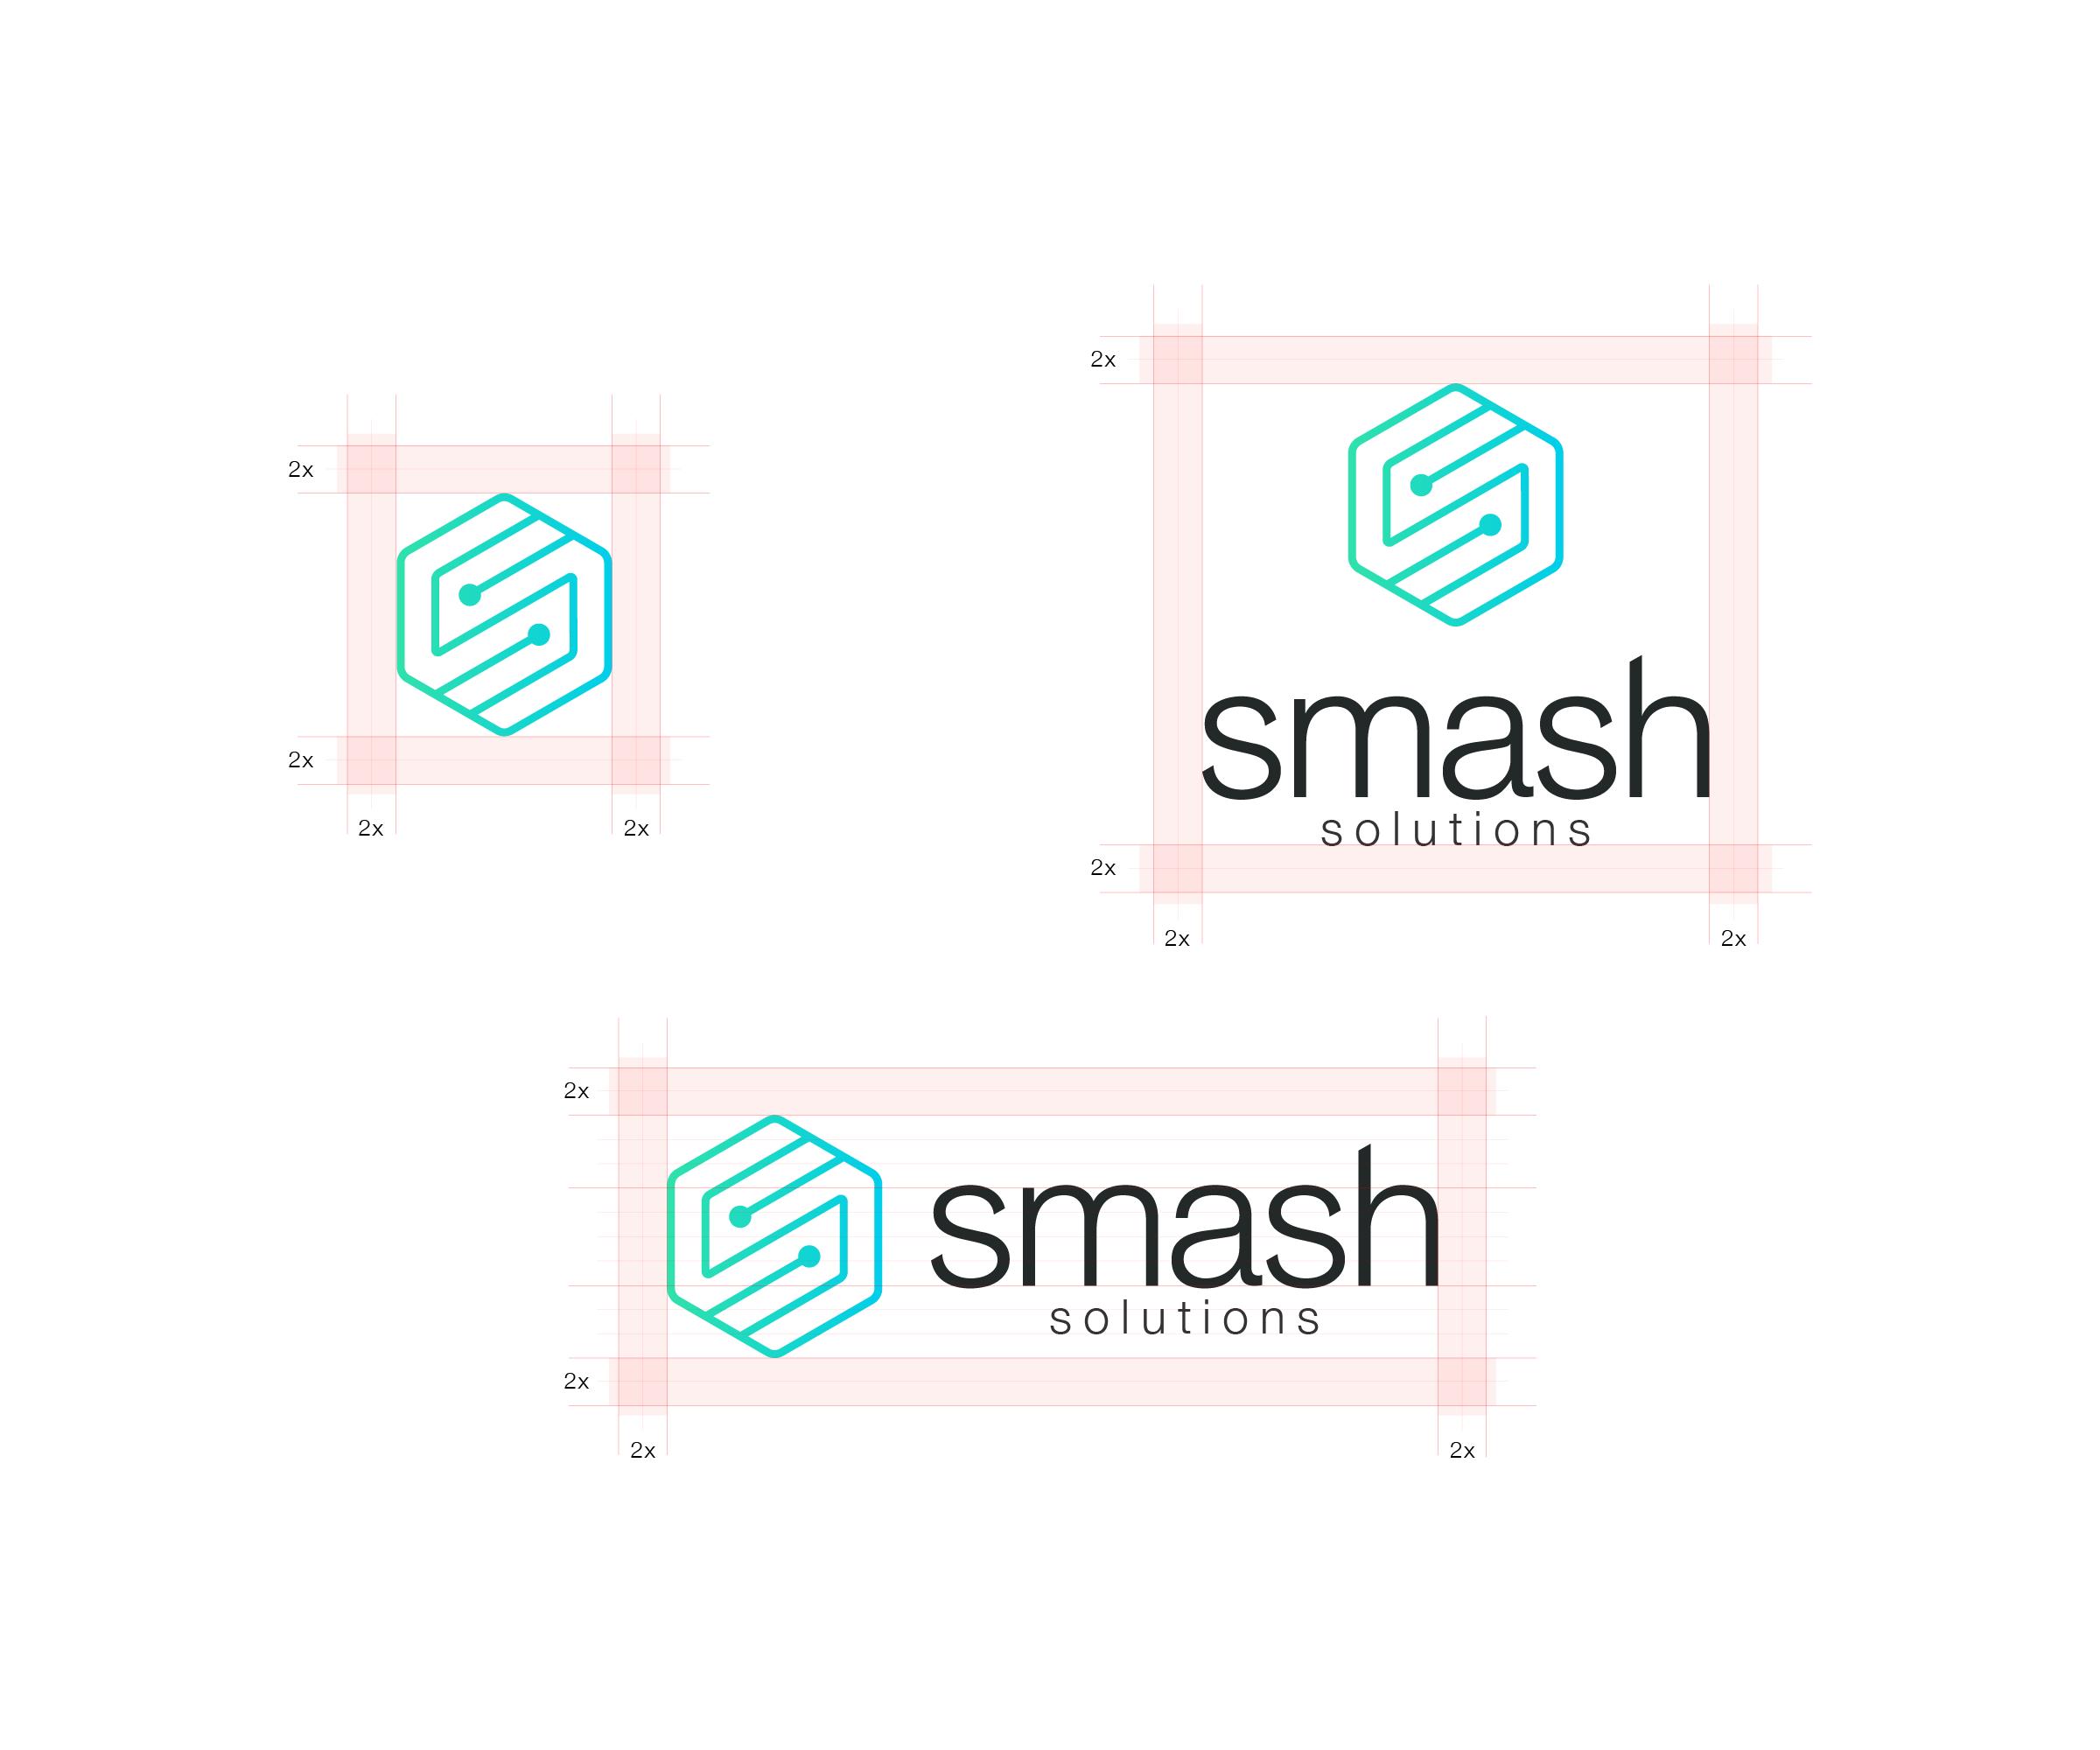 Smash logo variations